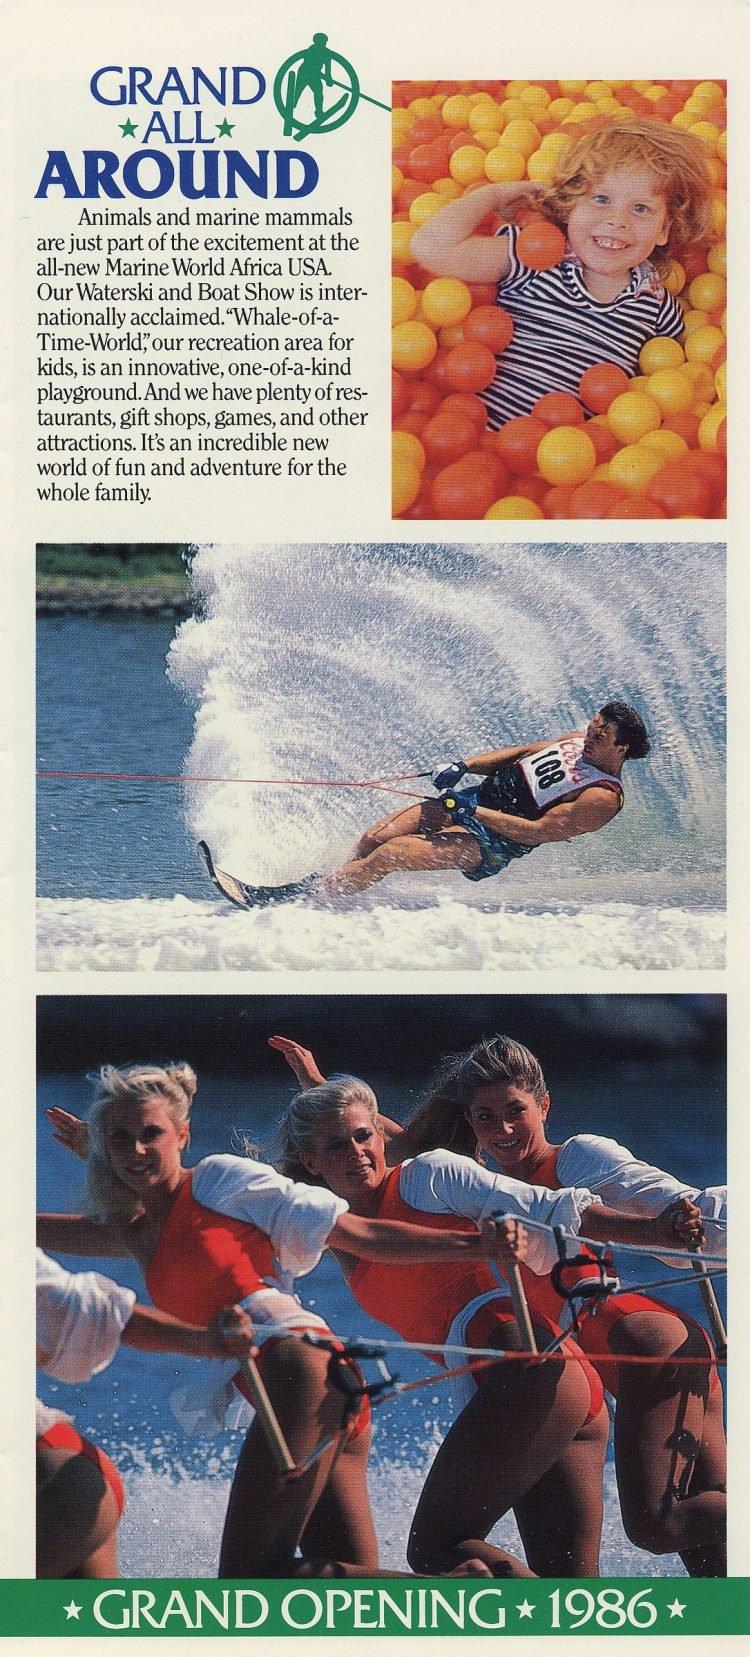 Marine World Africa USA - Grand Opening brochure 1986 (6)